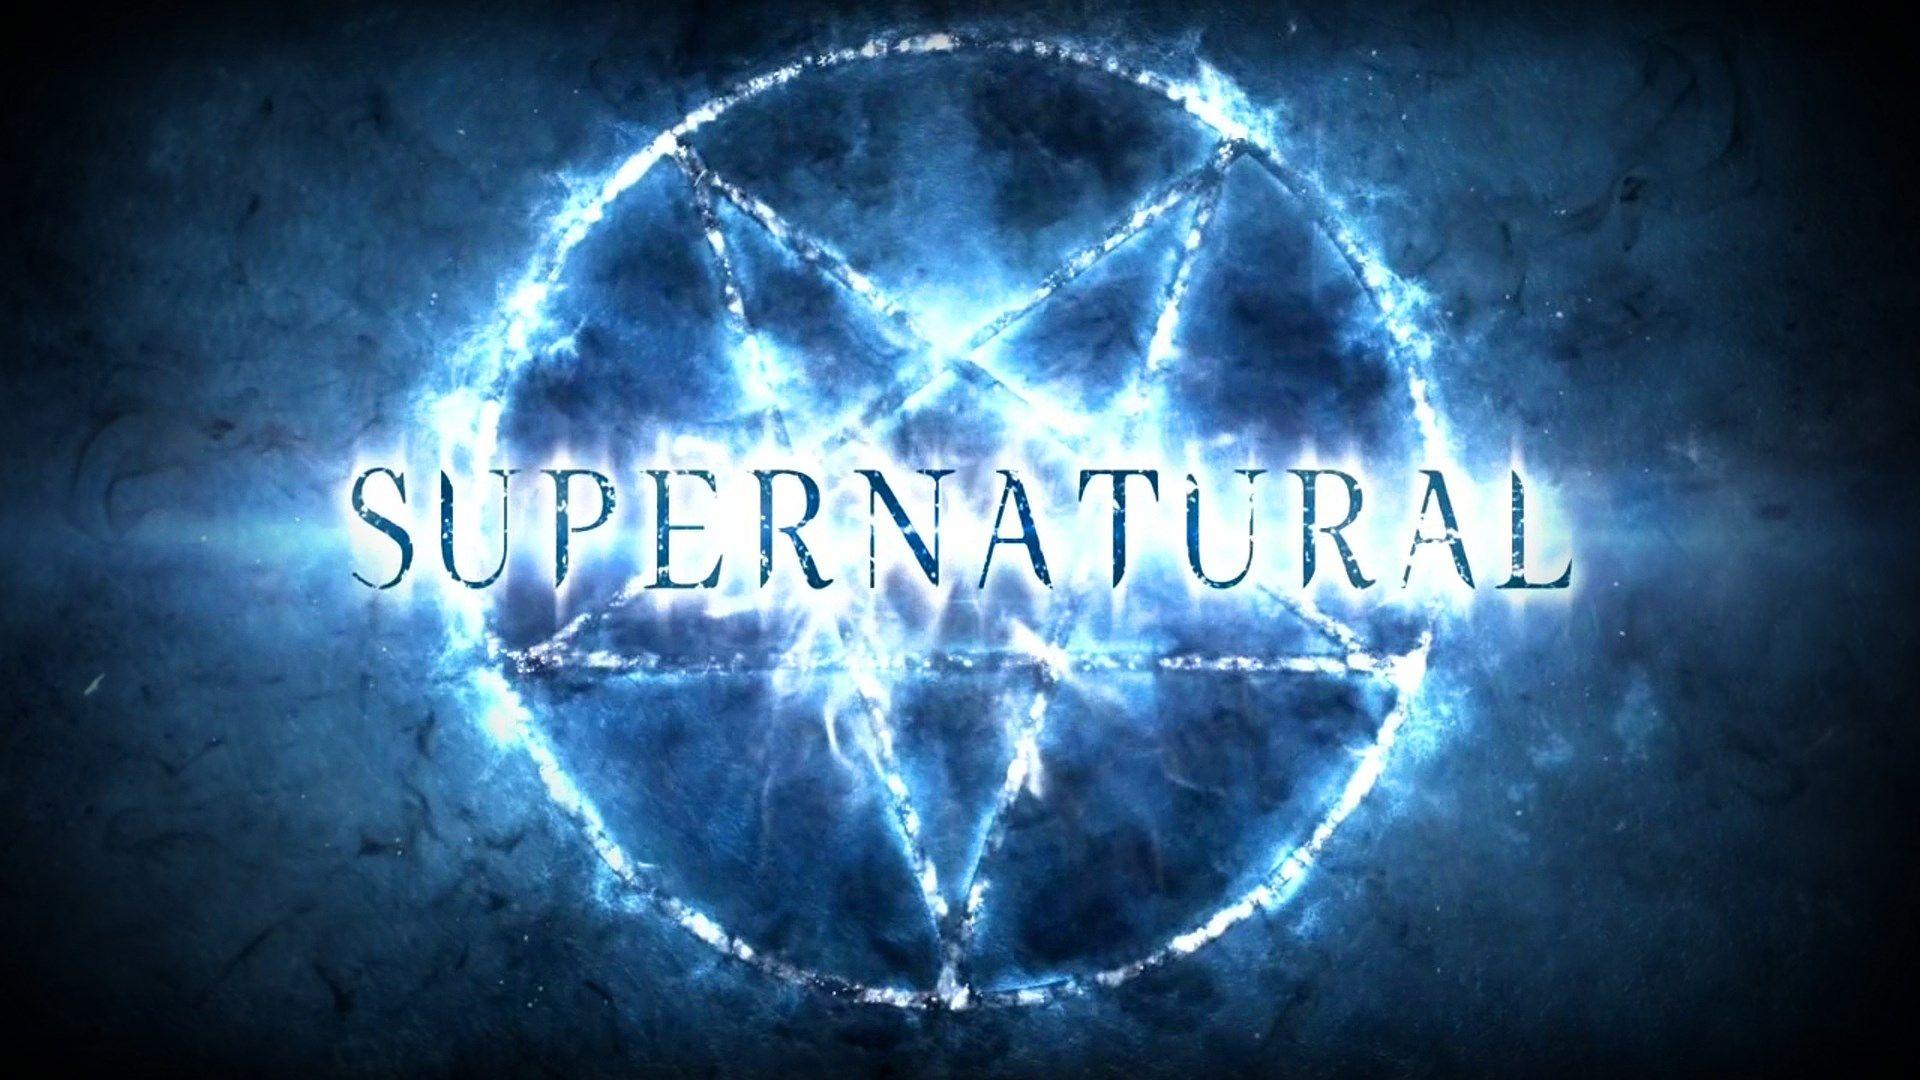 Top Wallpaper Logo Supernatural - 5e3e1242147adcb5b7241c8d1f846cb1  Image_1002953.jpg